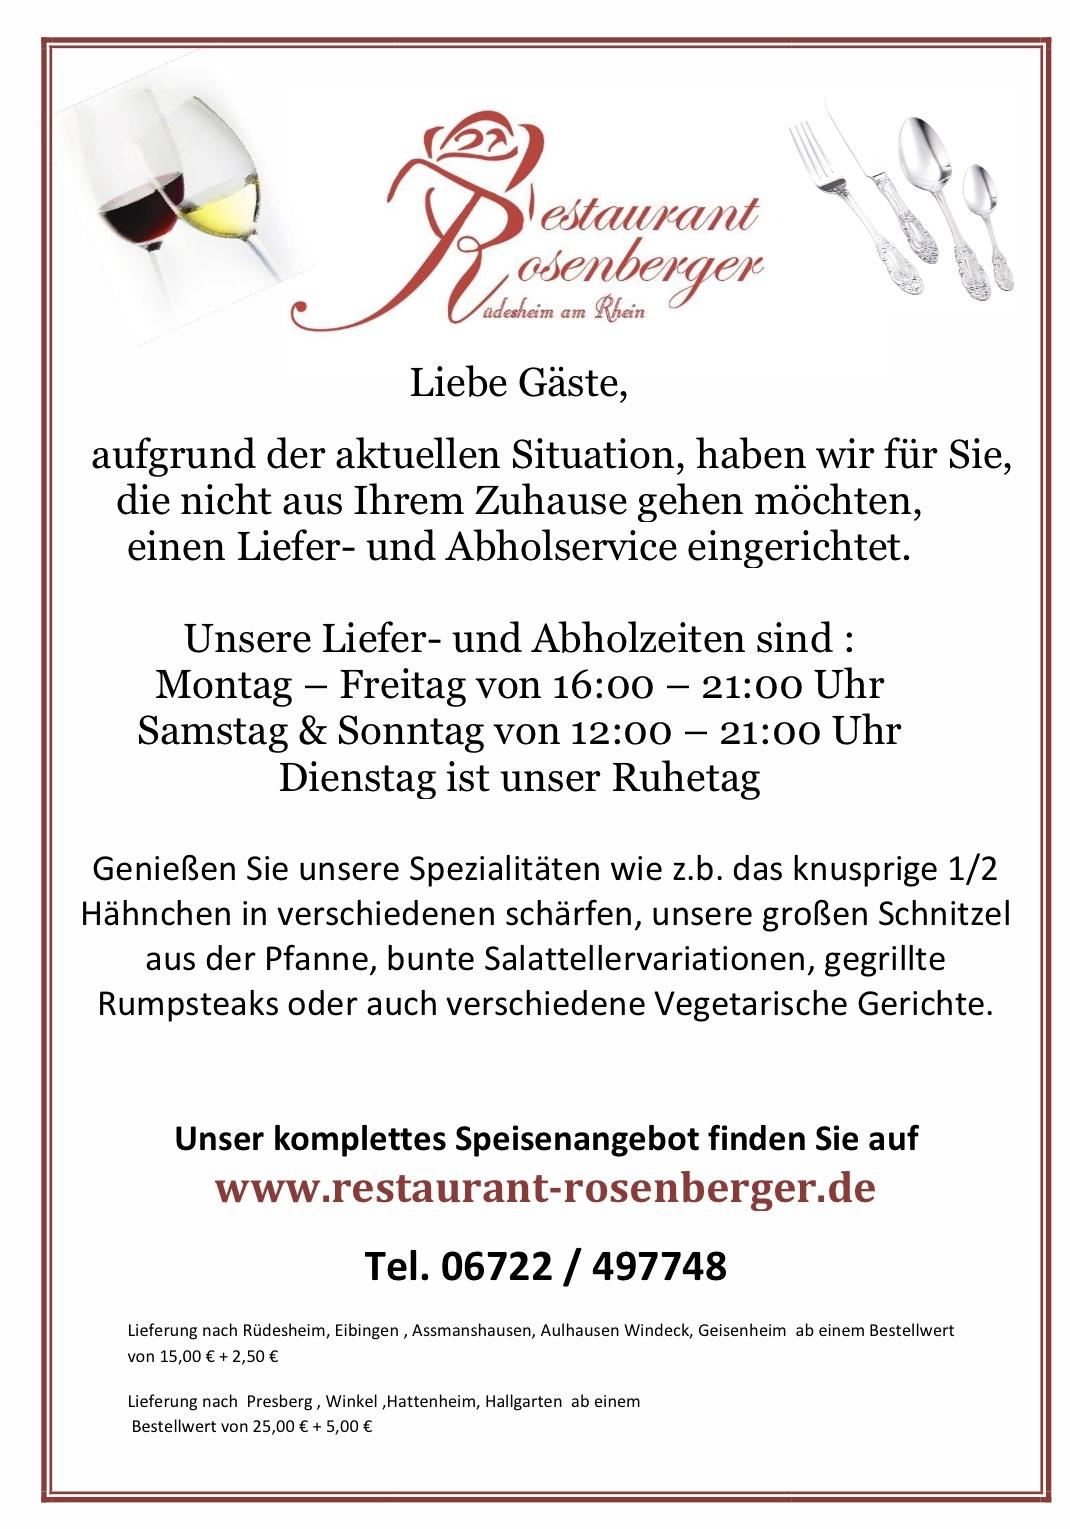 Willkommen bei Rosenberger